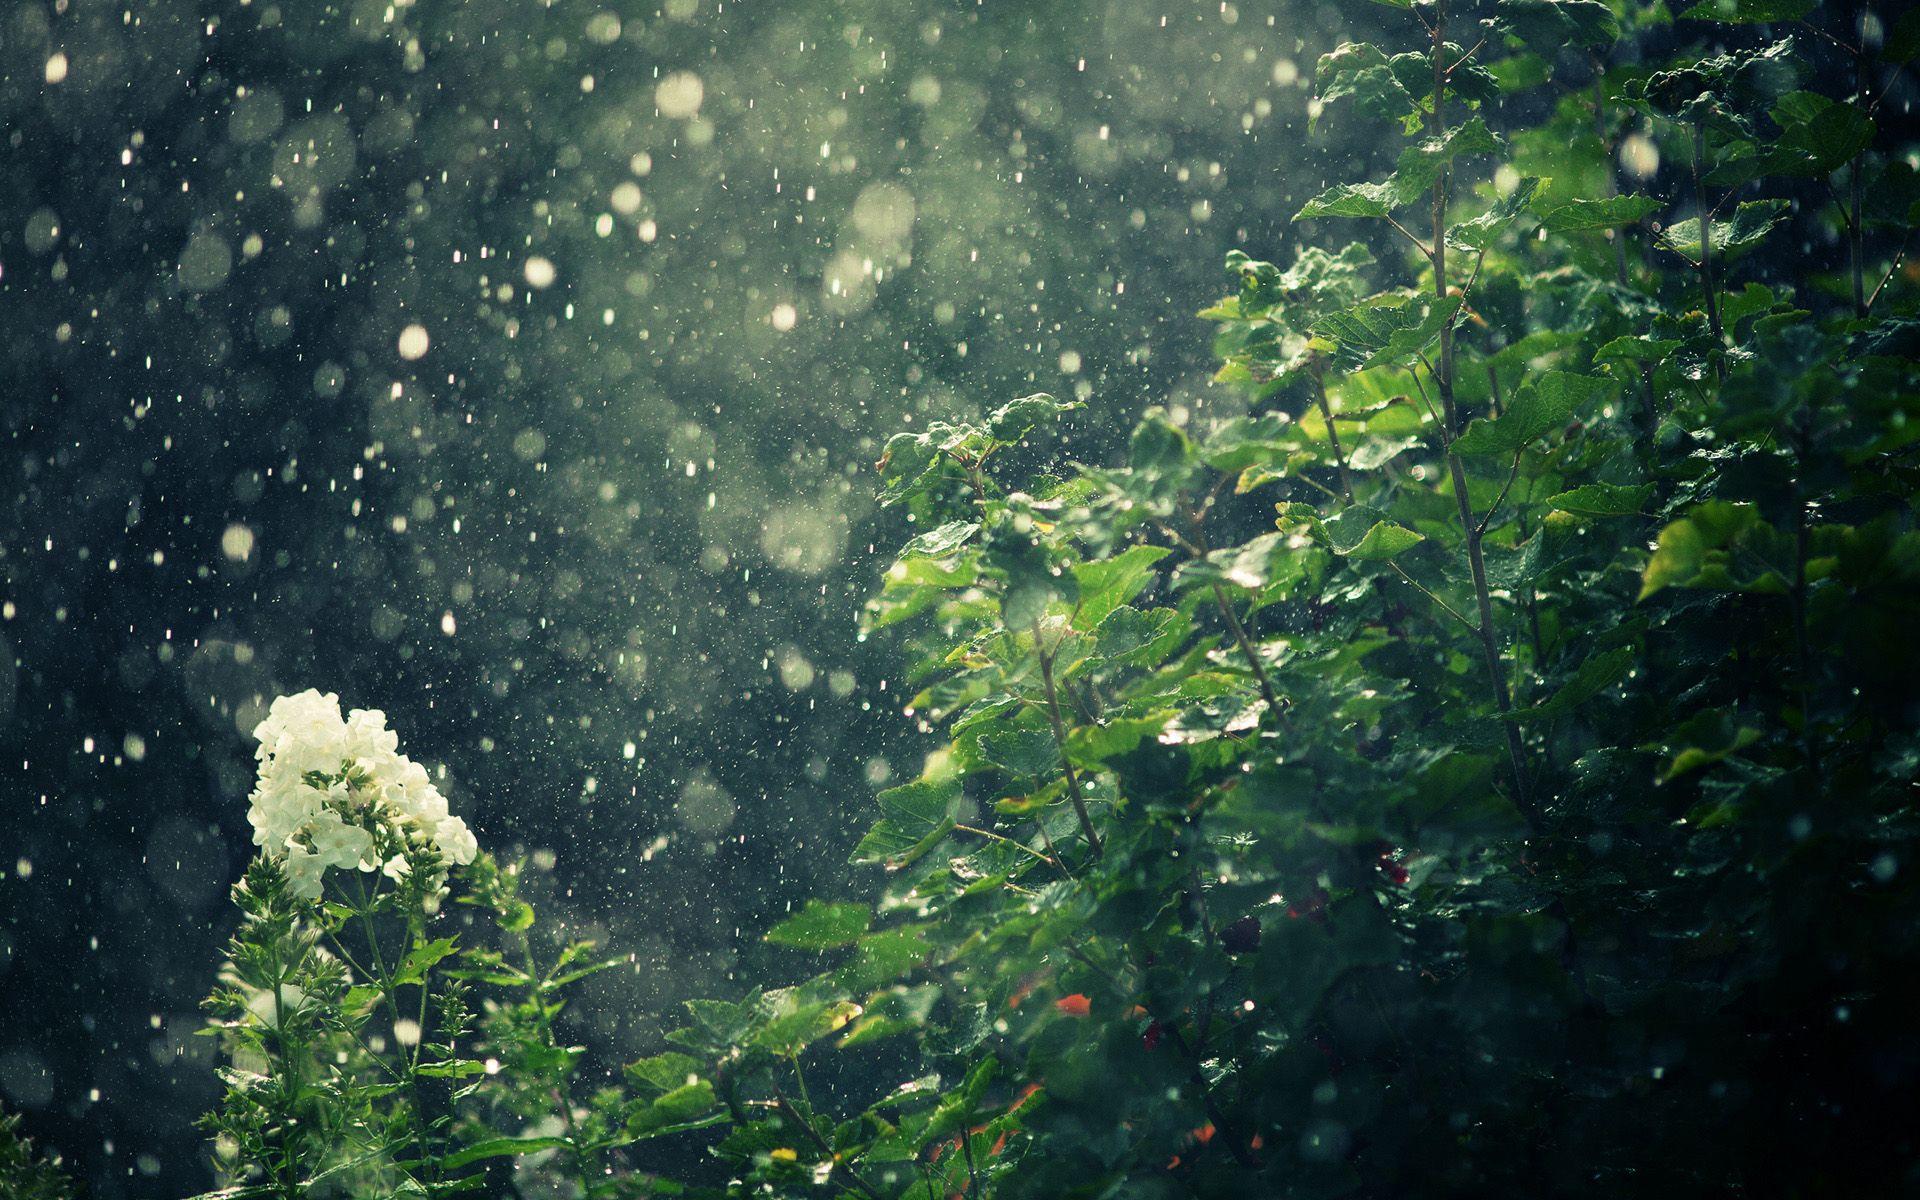 Photography Rain Wallpaper Rain Wallpapers Amazing Nature Photography Nature Photography